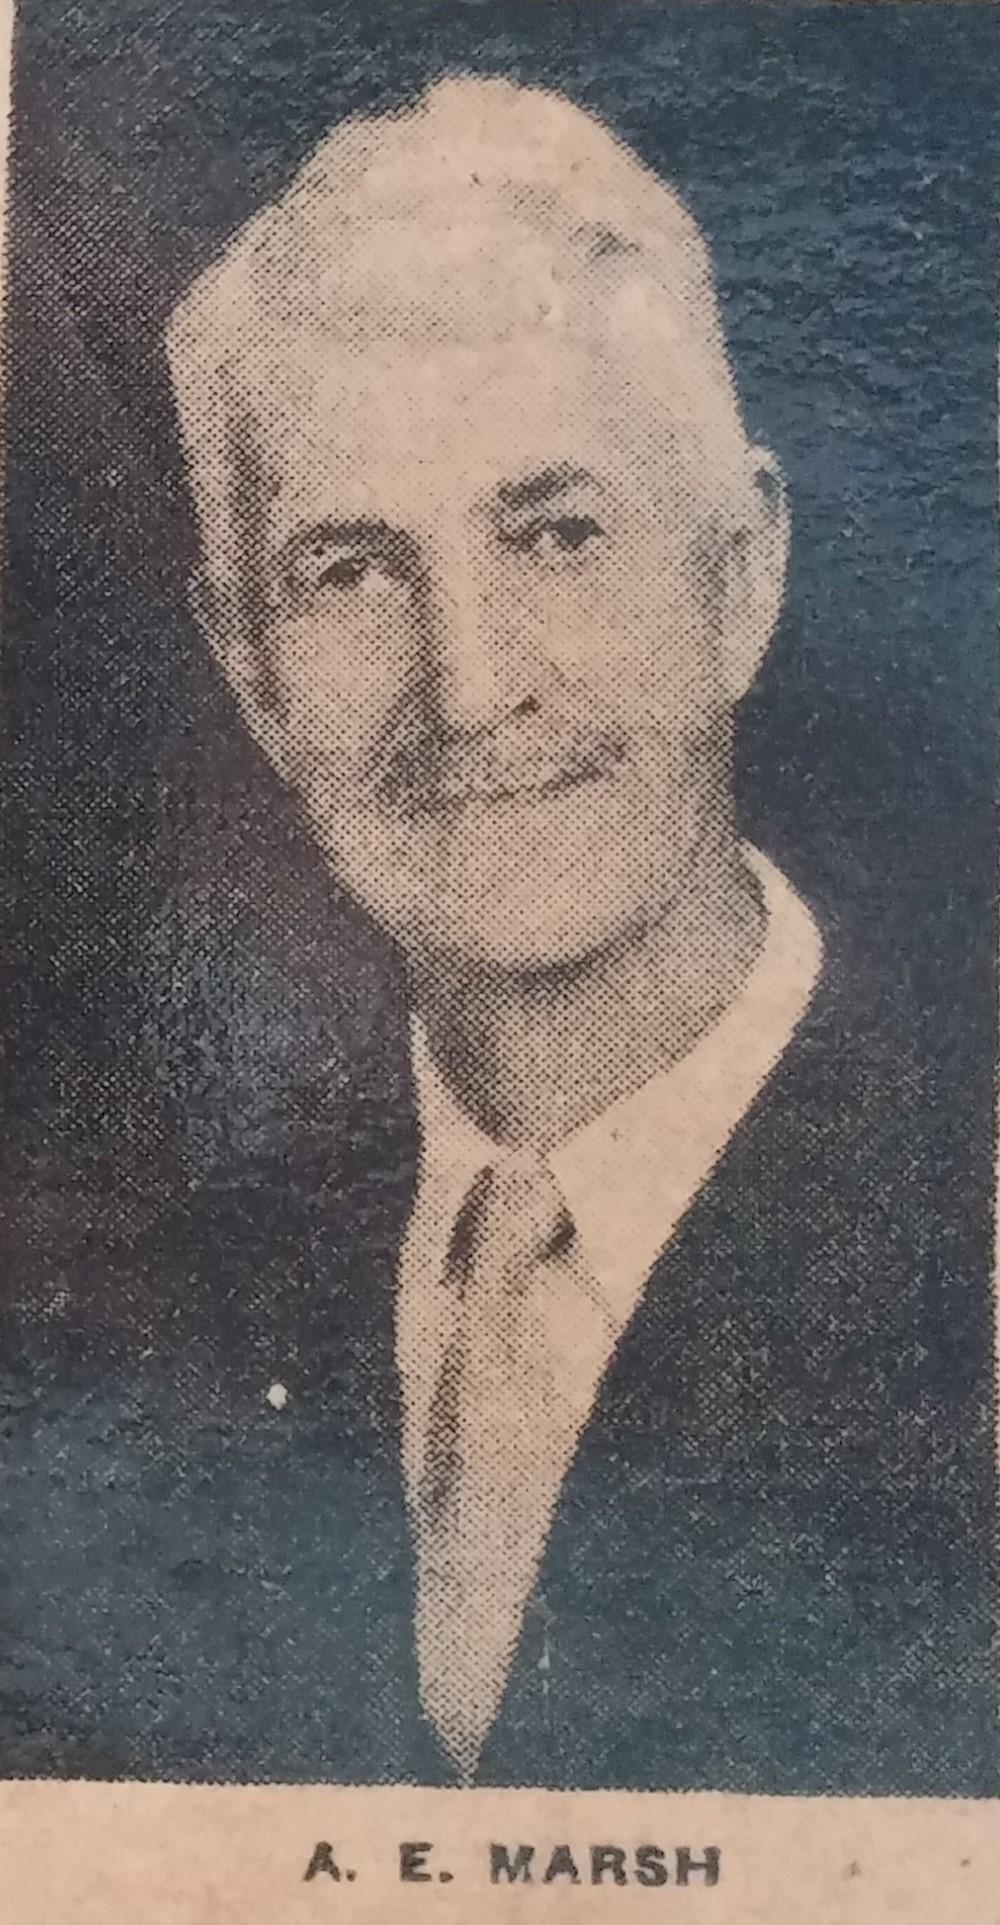 A. E. Marsh - 1940